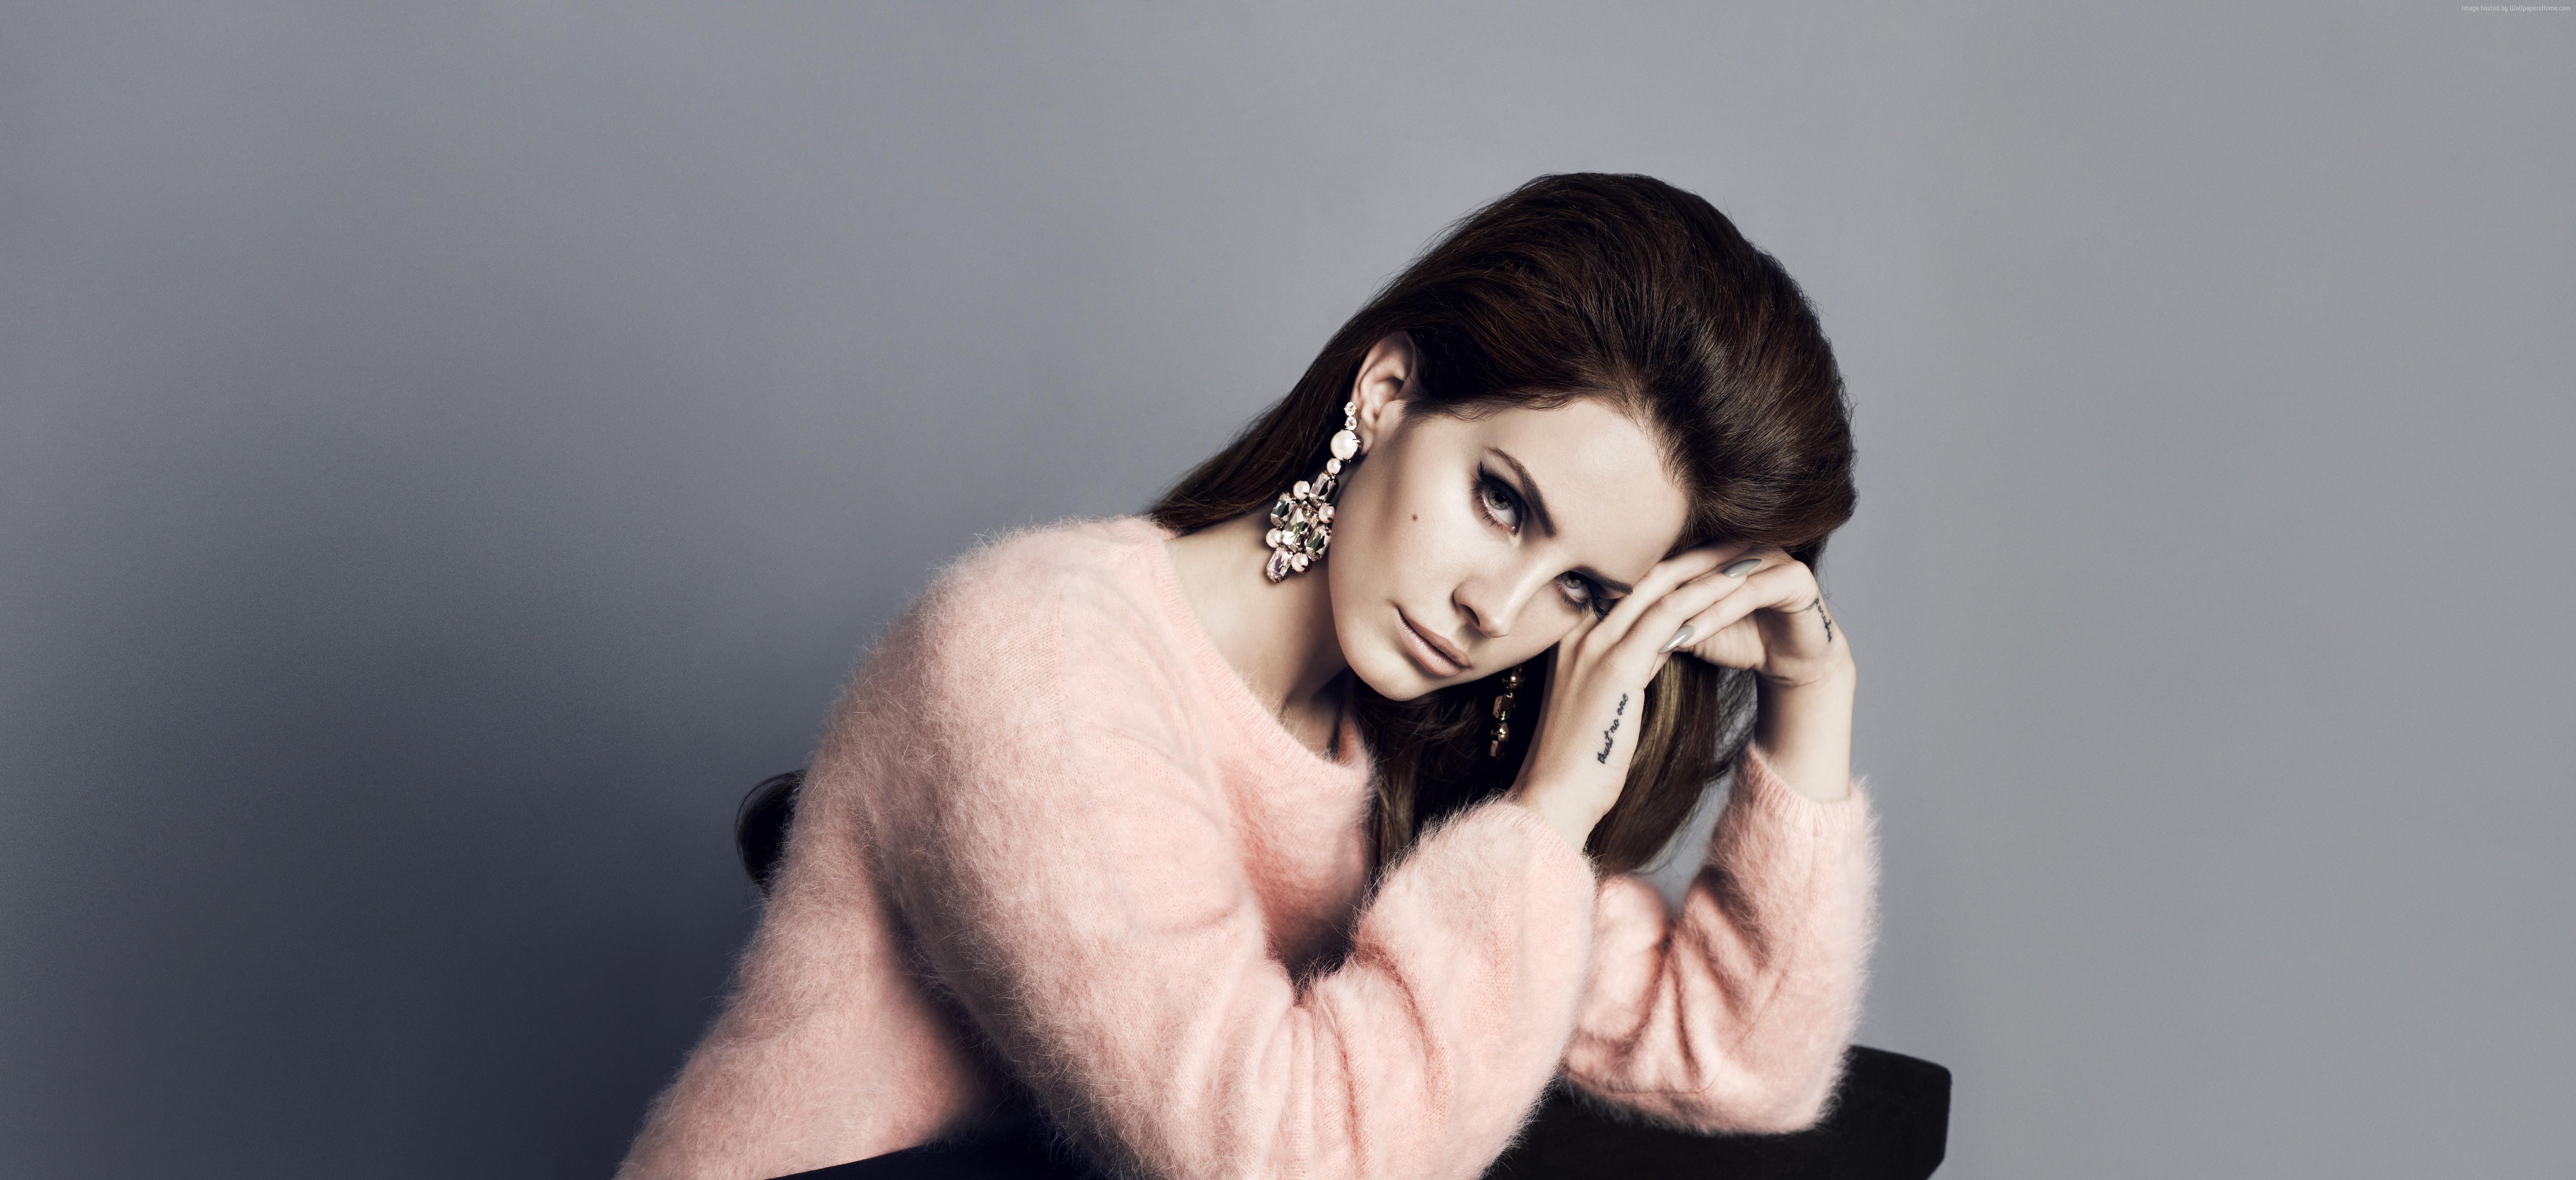 Must see Wallpaper Mac Lana Del Rey - lana-del-rey-5412x2480-top-music-artist-and-bands-singer-5773  Snapshot_297261.jpg